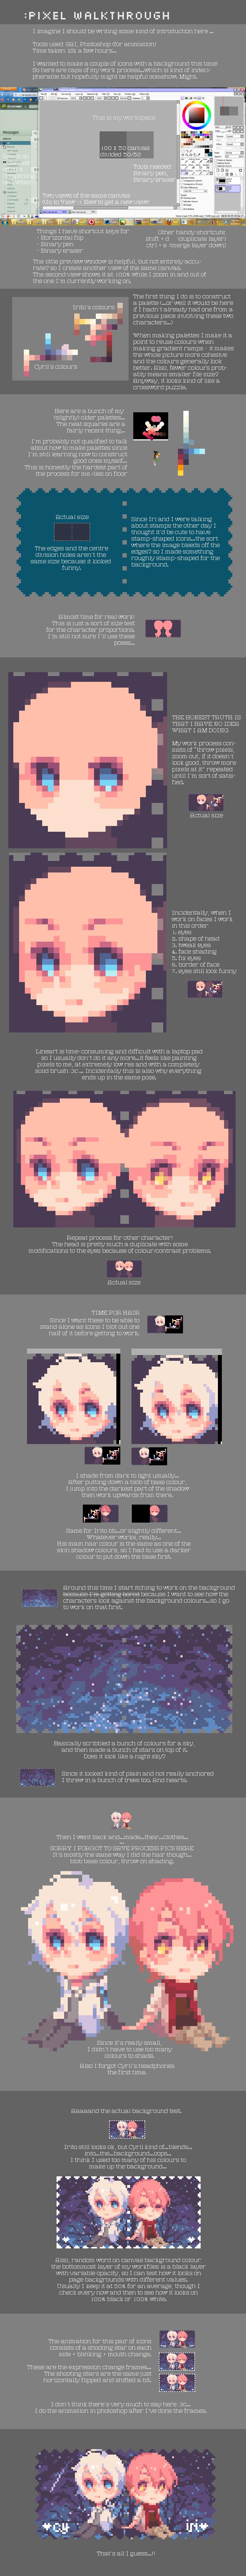 Pixel walkthrough